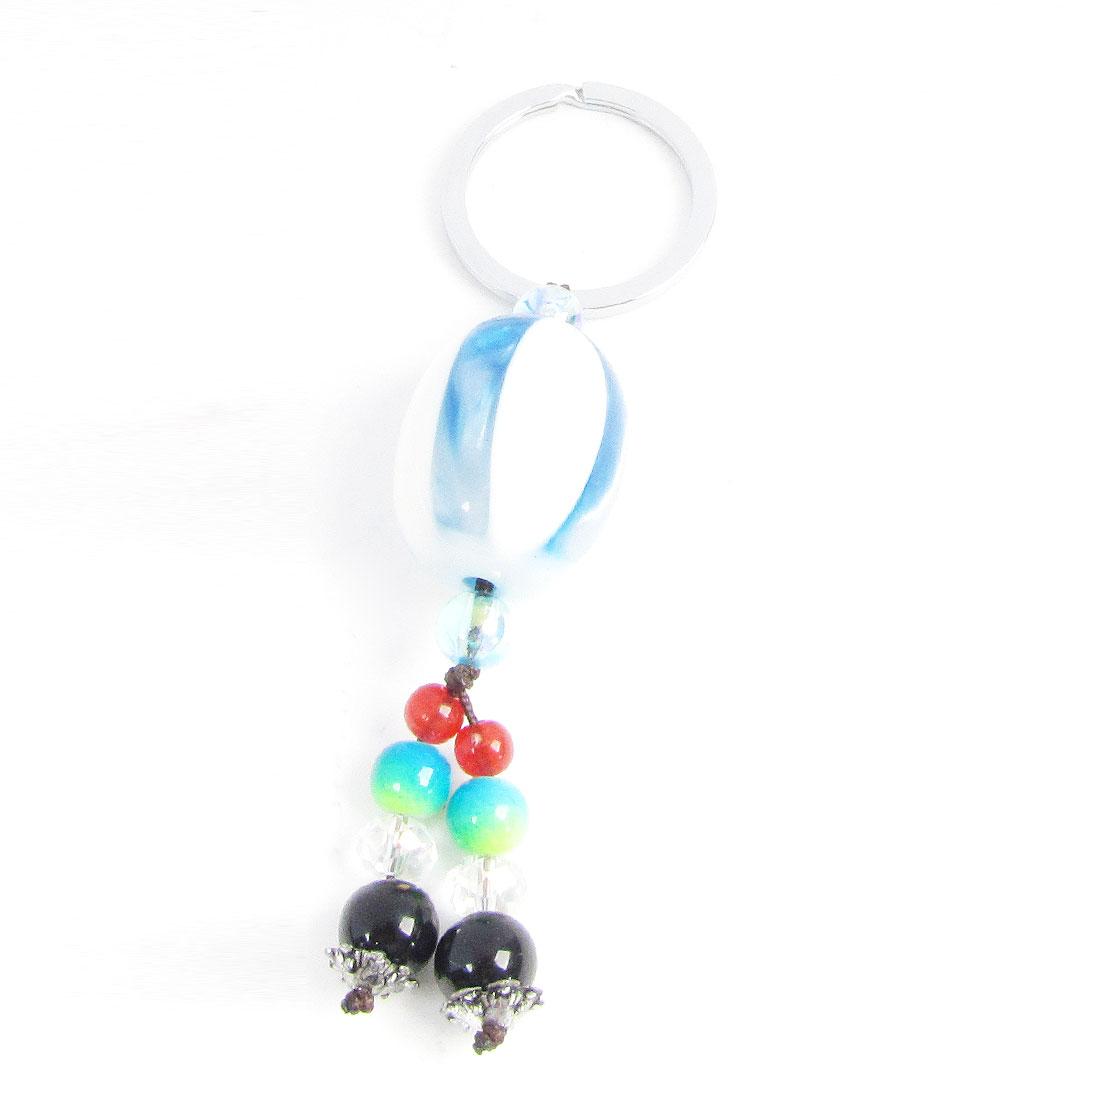 Black Beads Blue White Oval Faux Jade Pendant Keys Ring Keyring Keychain